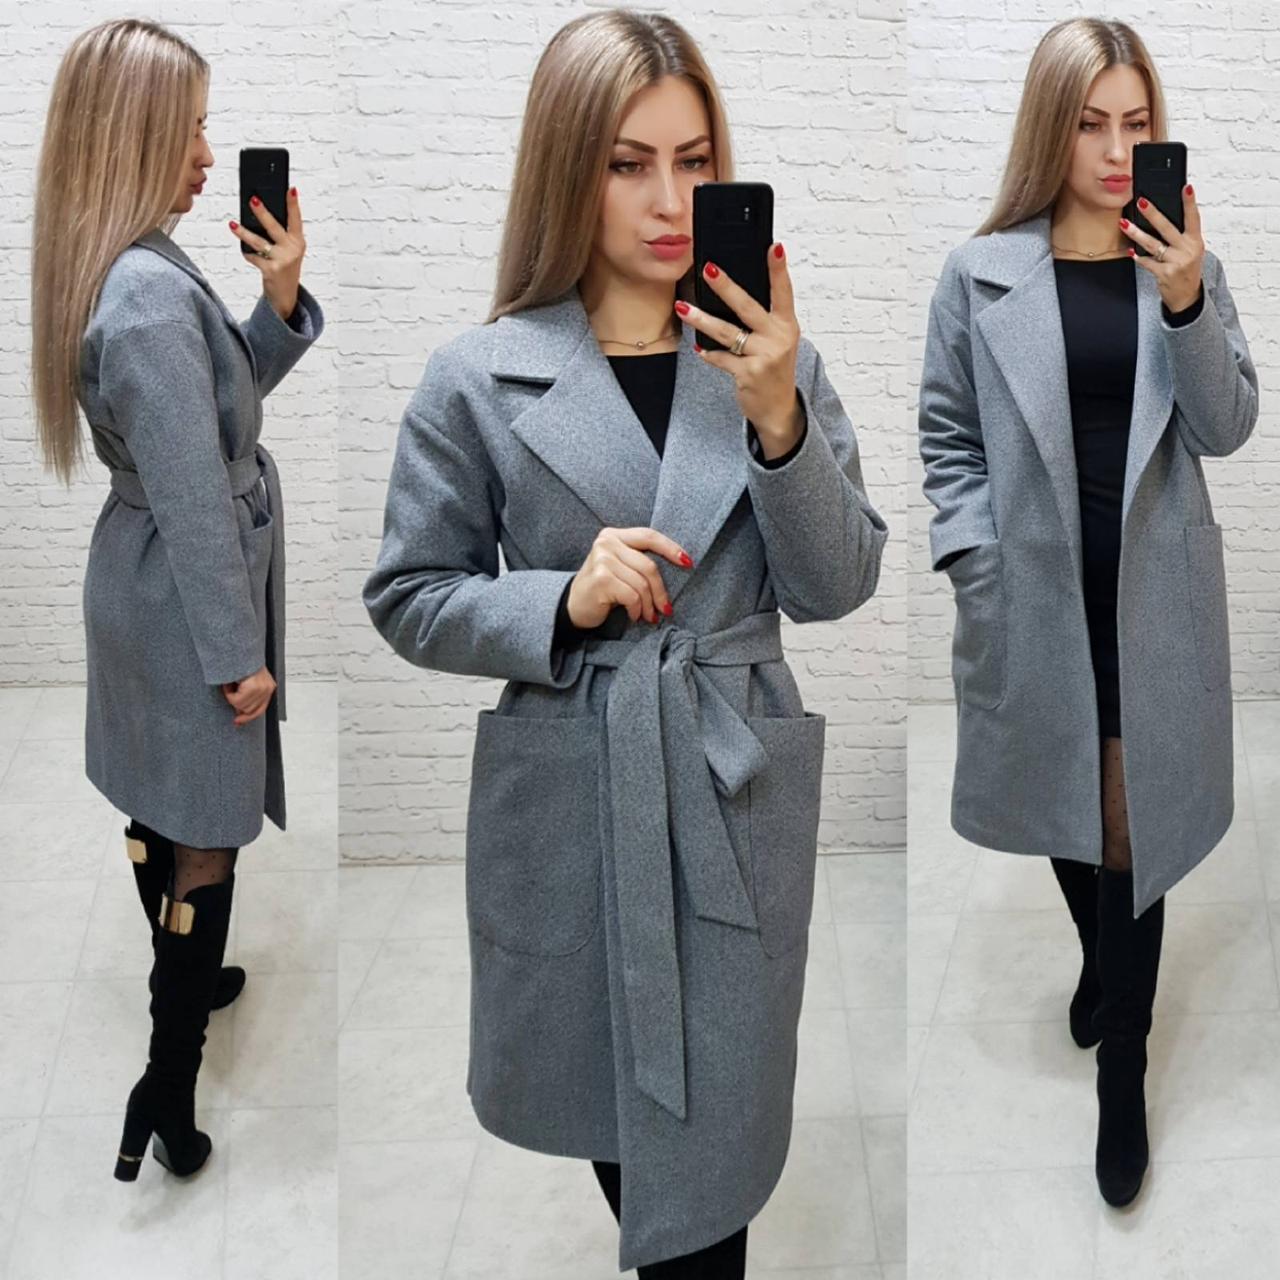 Кашемировое пальто на запах, цвет 02,елочка,  евро-зима, ткань кашемир на трикотаже, арт 175